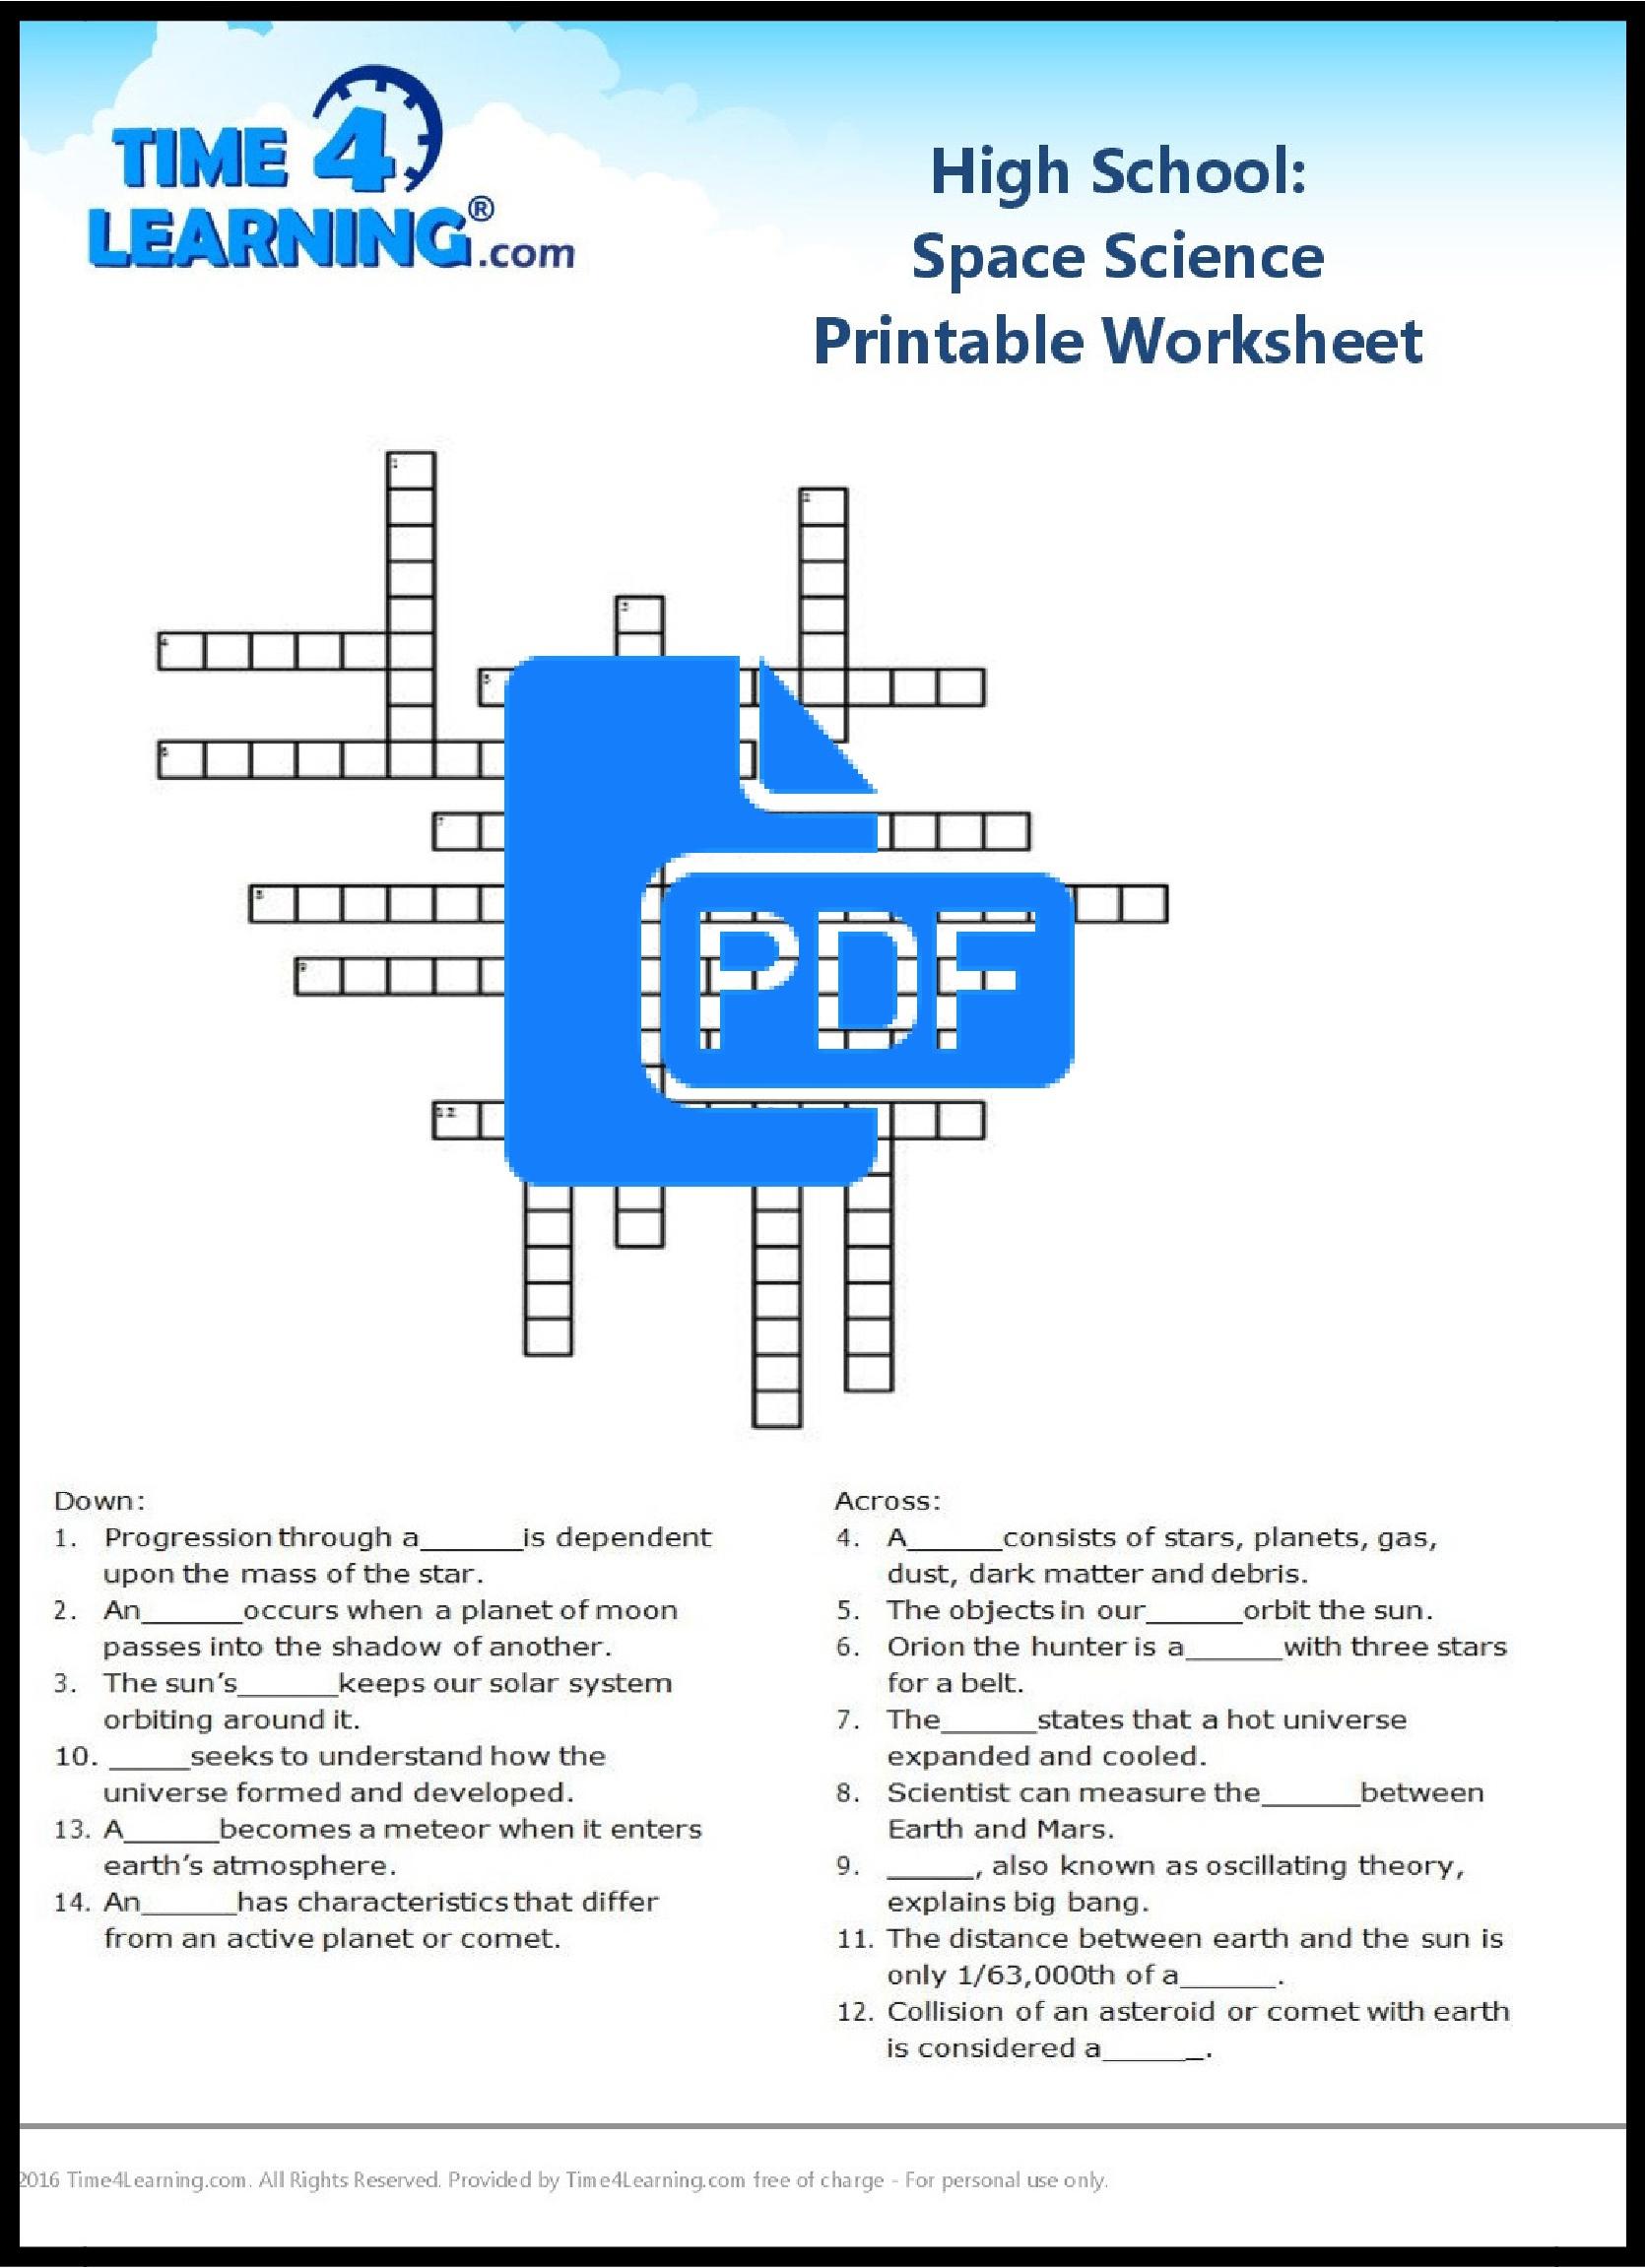 Free Printable: High School Space Science Worksheet | Time4Learning | Free Printable High School Worksheets